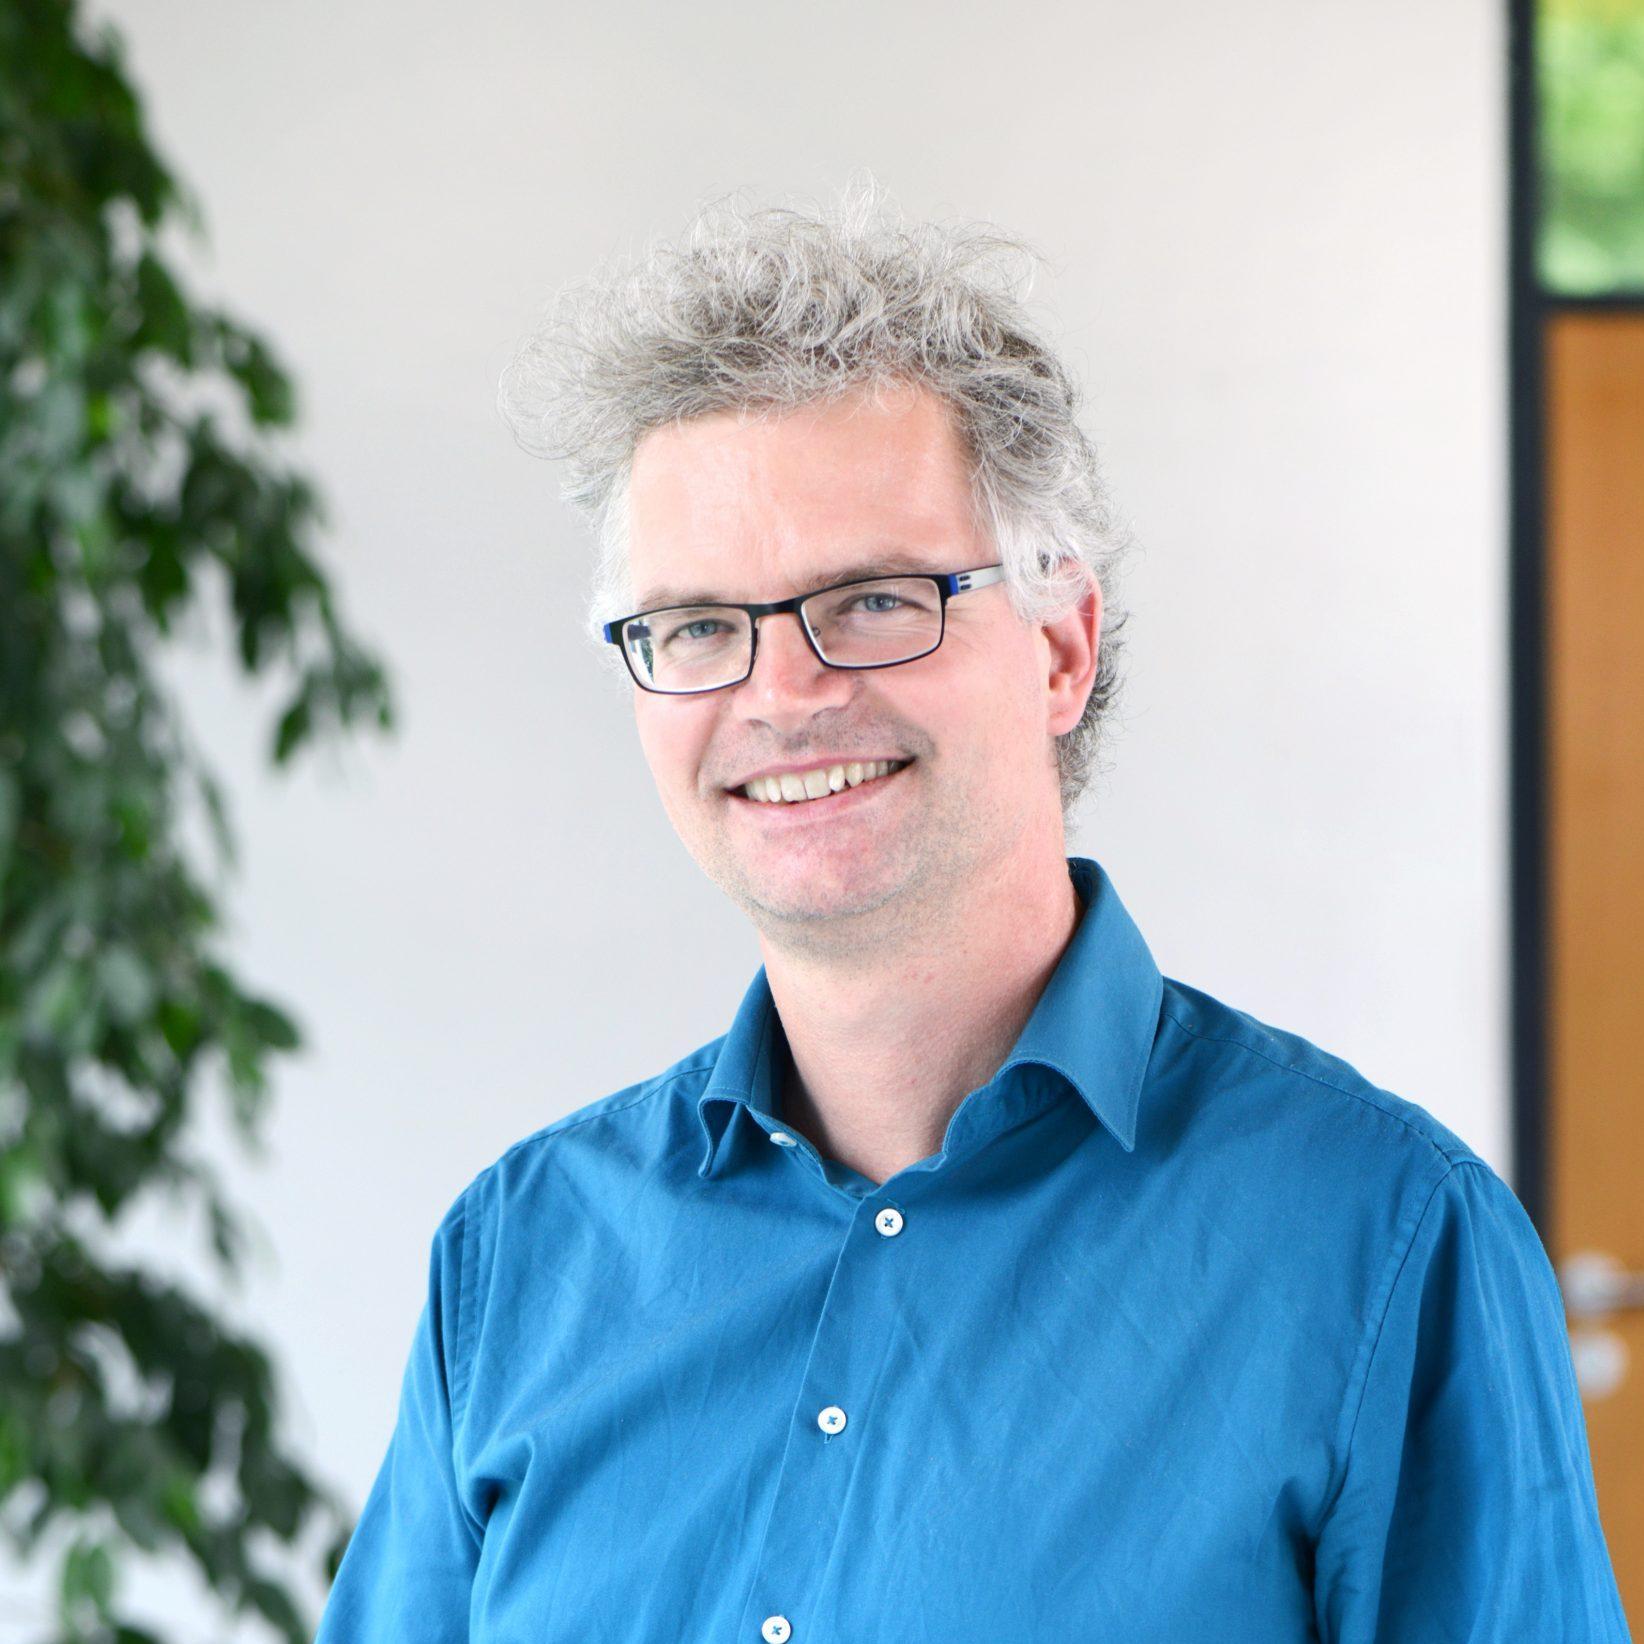 Prof. Dr. Michael Hoelscher